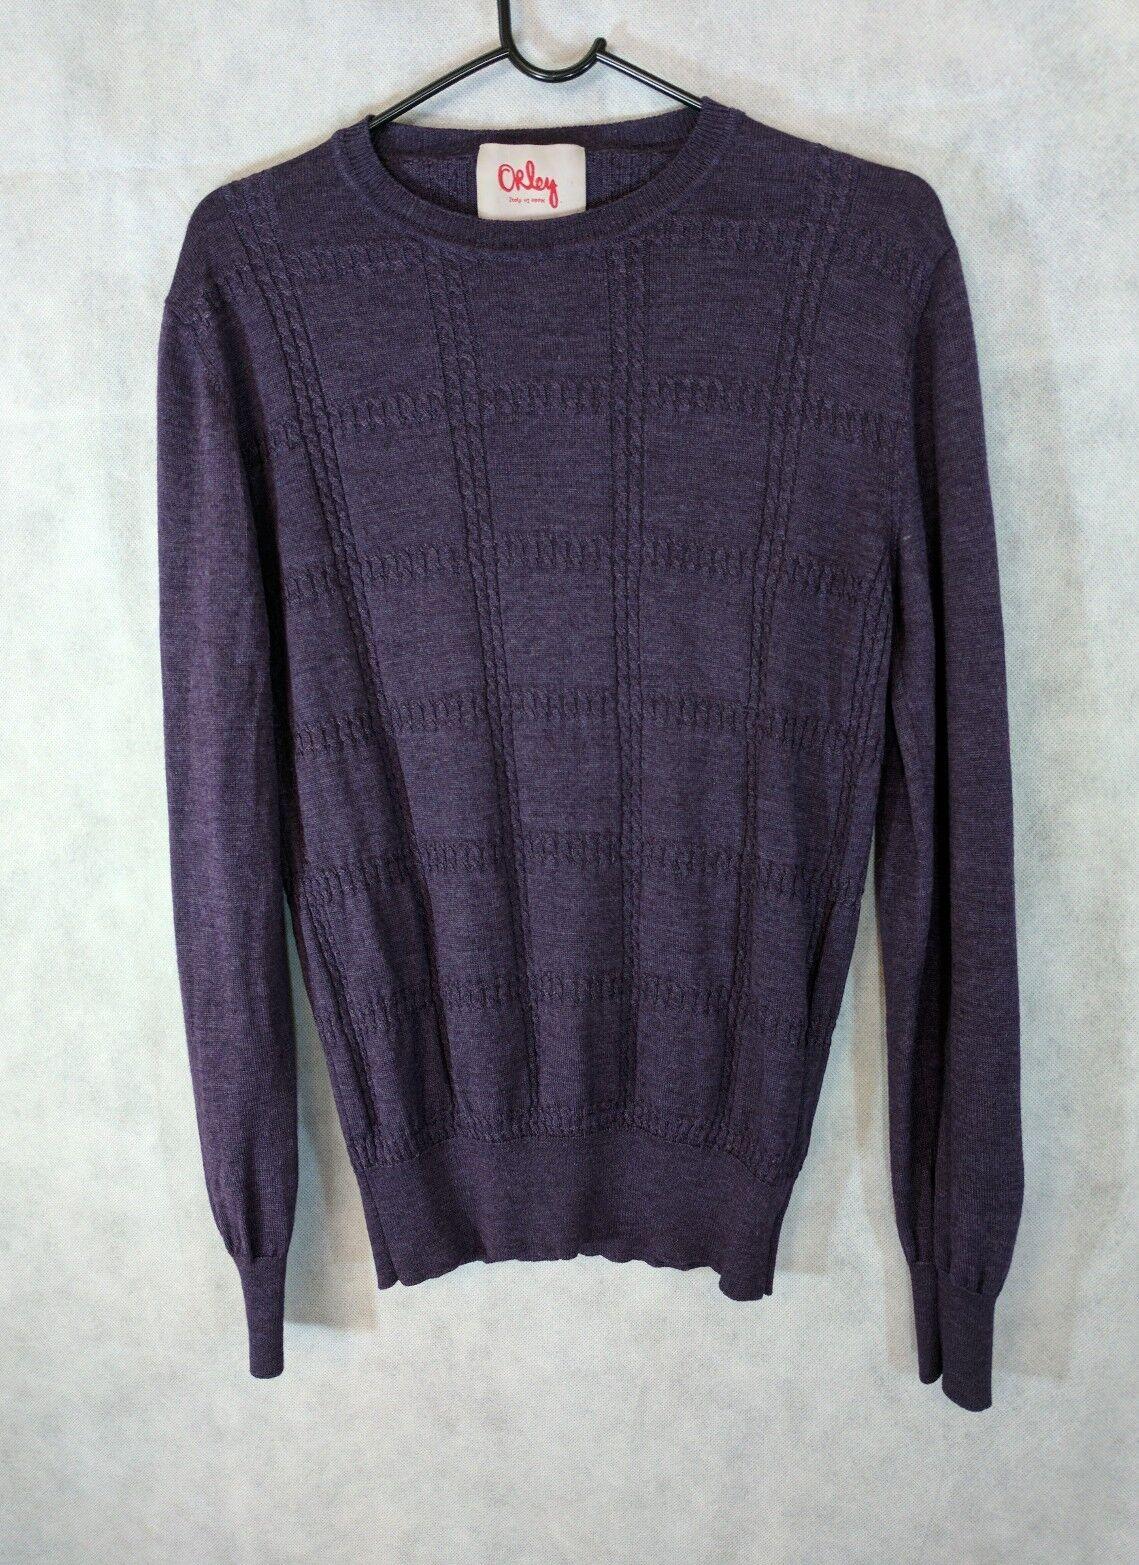 Orley Merino Wool /Silk Blend TextuROT Italian Sweater S